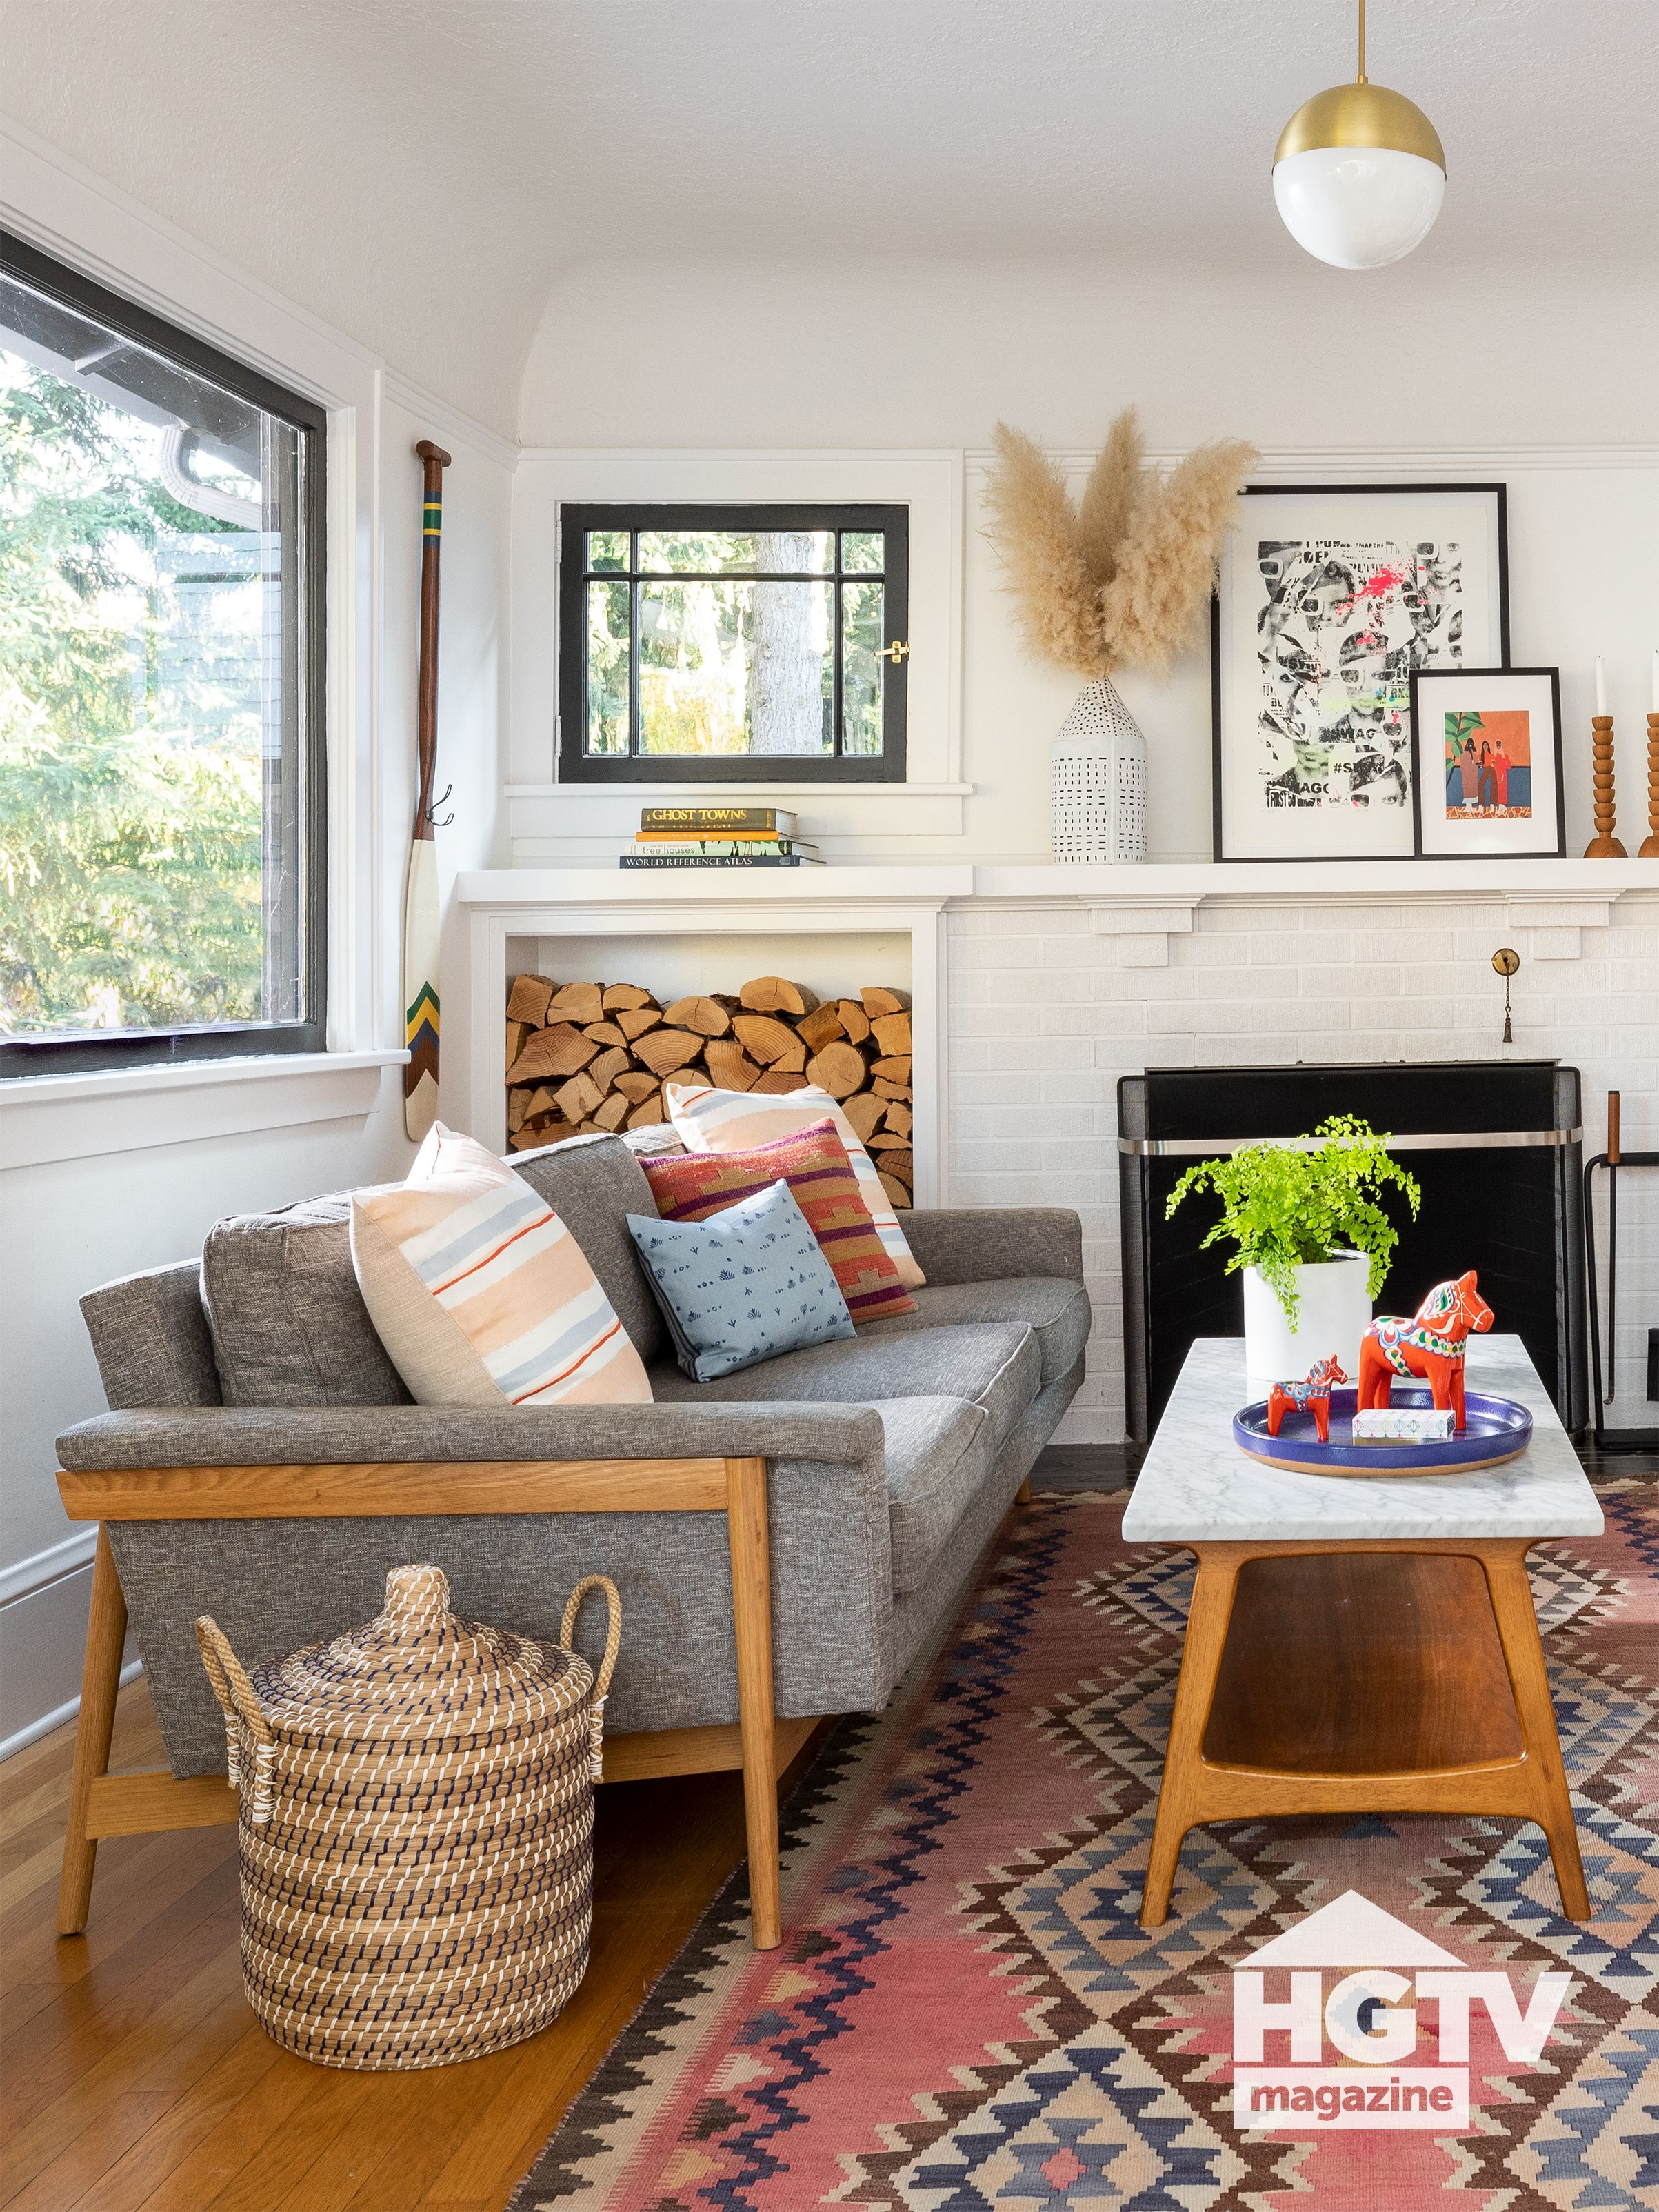 A Scandinavian Living Room From Hgtv Magazine In 2020 Funky Living Rooms Living Room Scandinavian Home Decor Bedroom